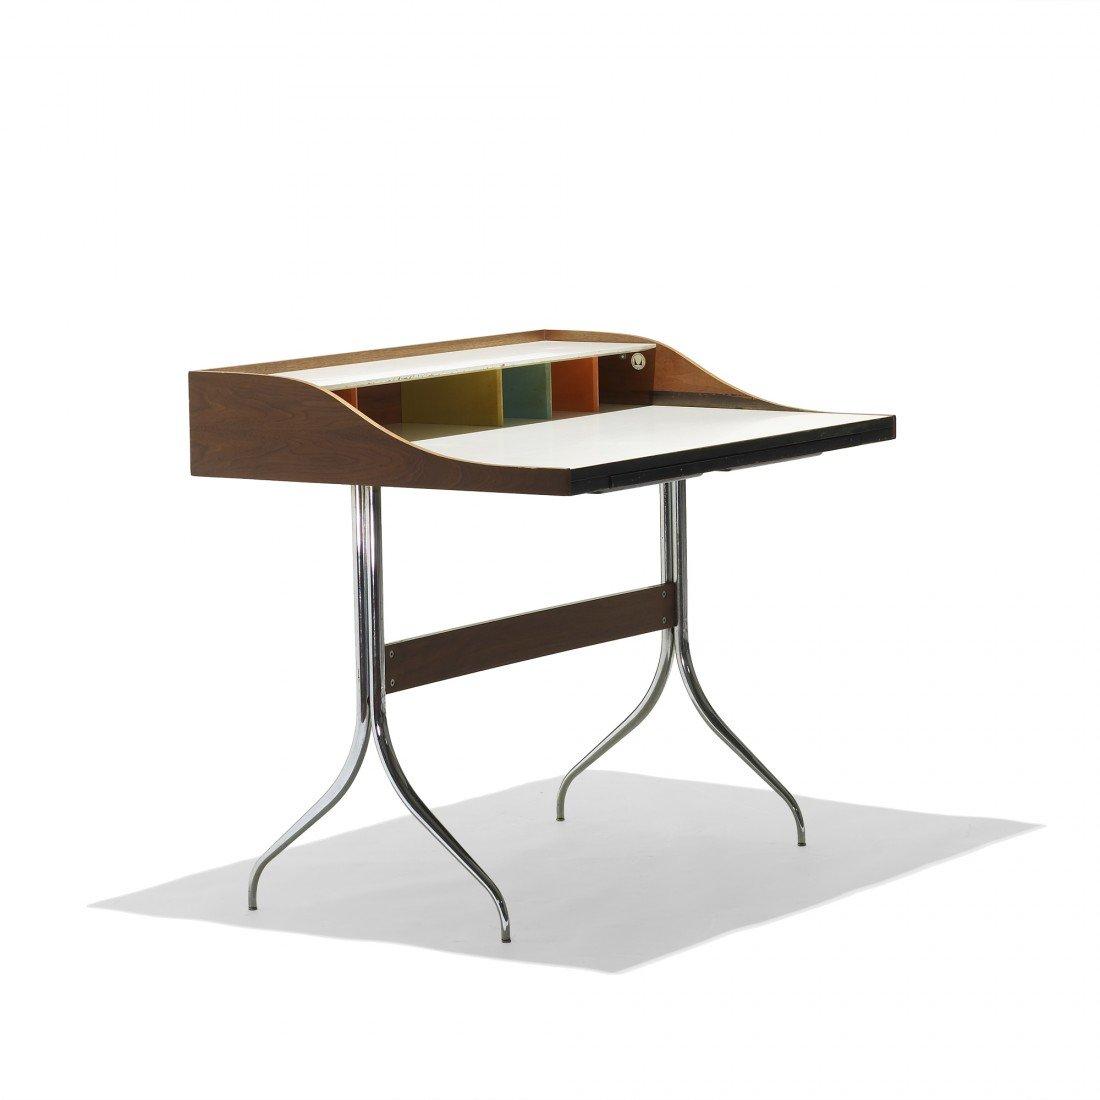 143: George Nelson & Associates Swaged-Leg desk